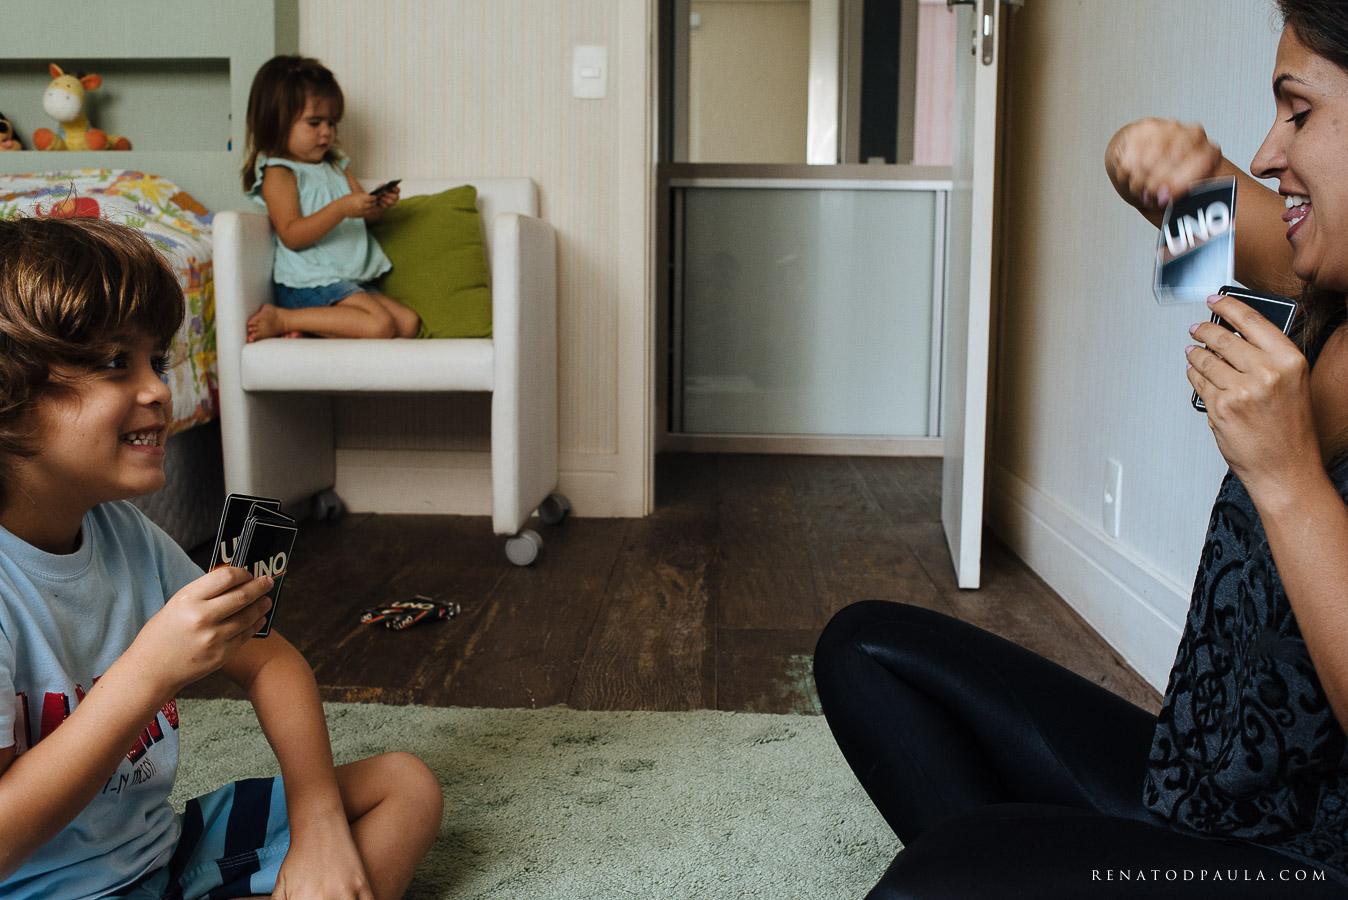 renato-dpaula-fotografia-de-familia-documental-18